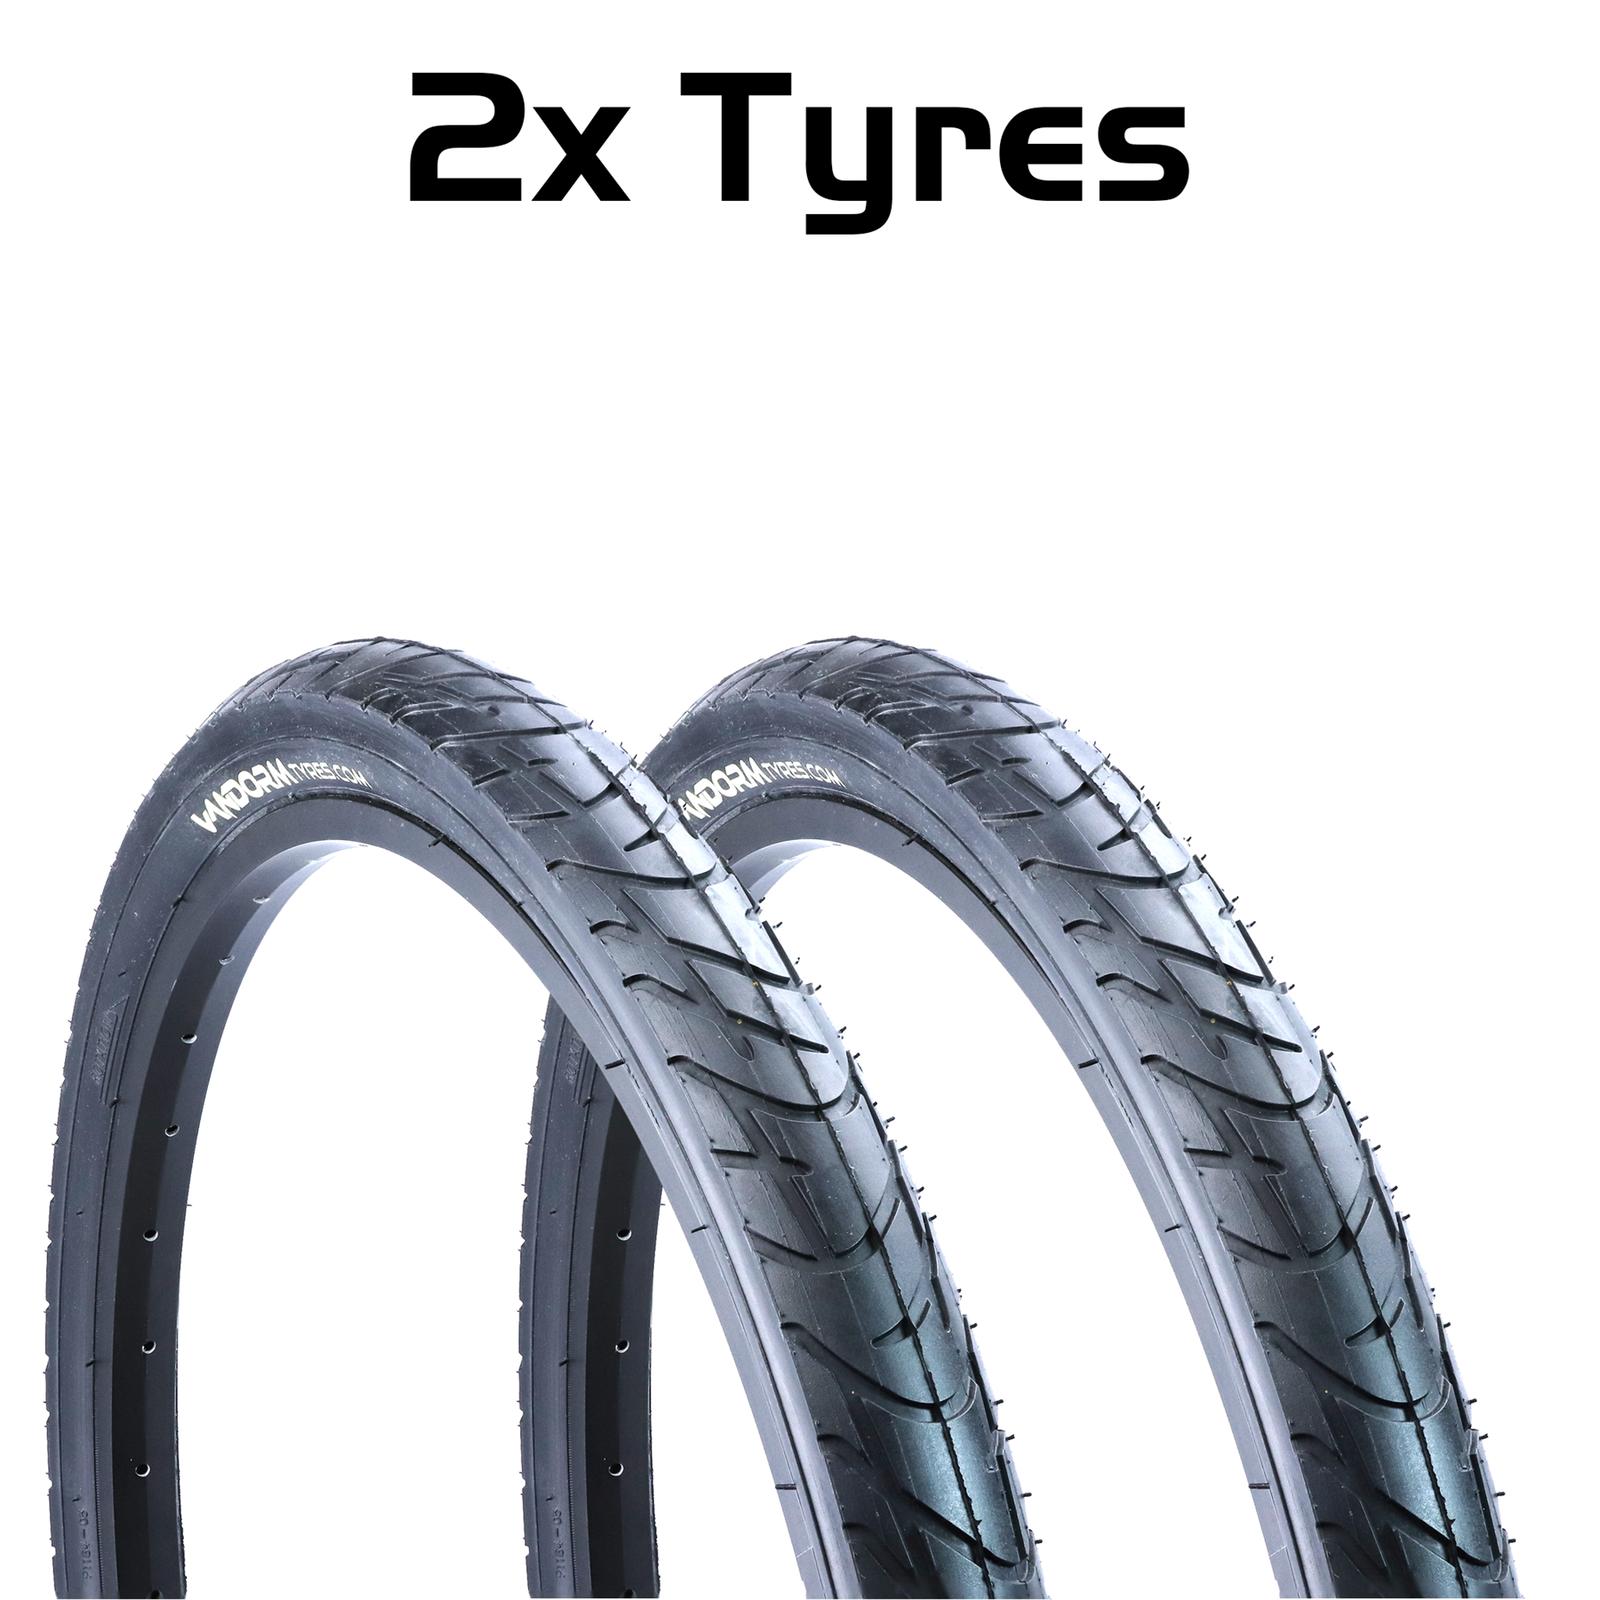 Pair of Fincci Slick Road Mountain Hybrid Bike Bicycle Tyres 26 x 1.95 54-559